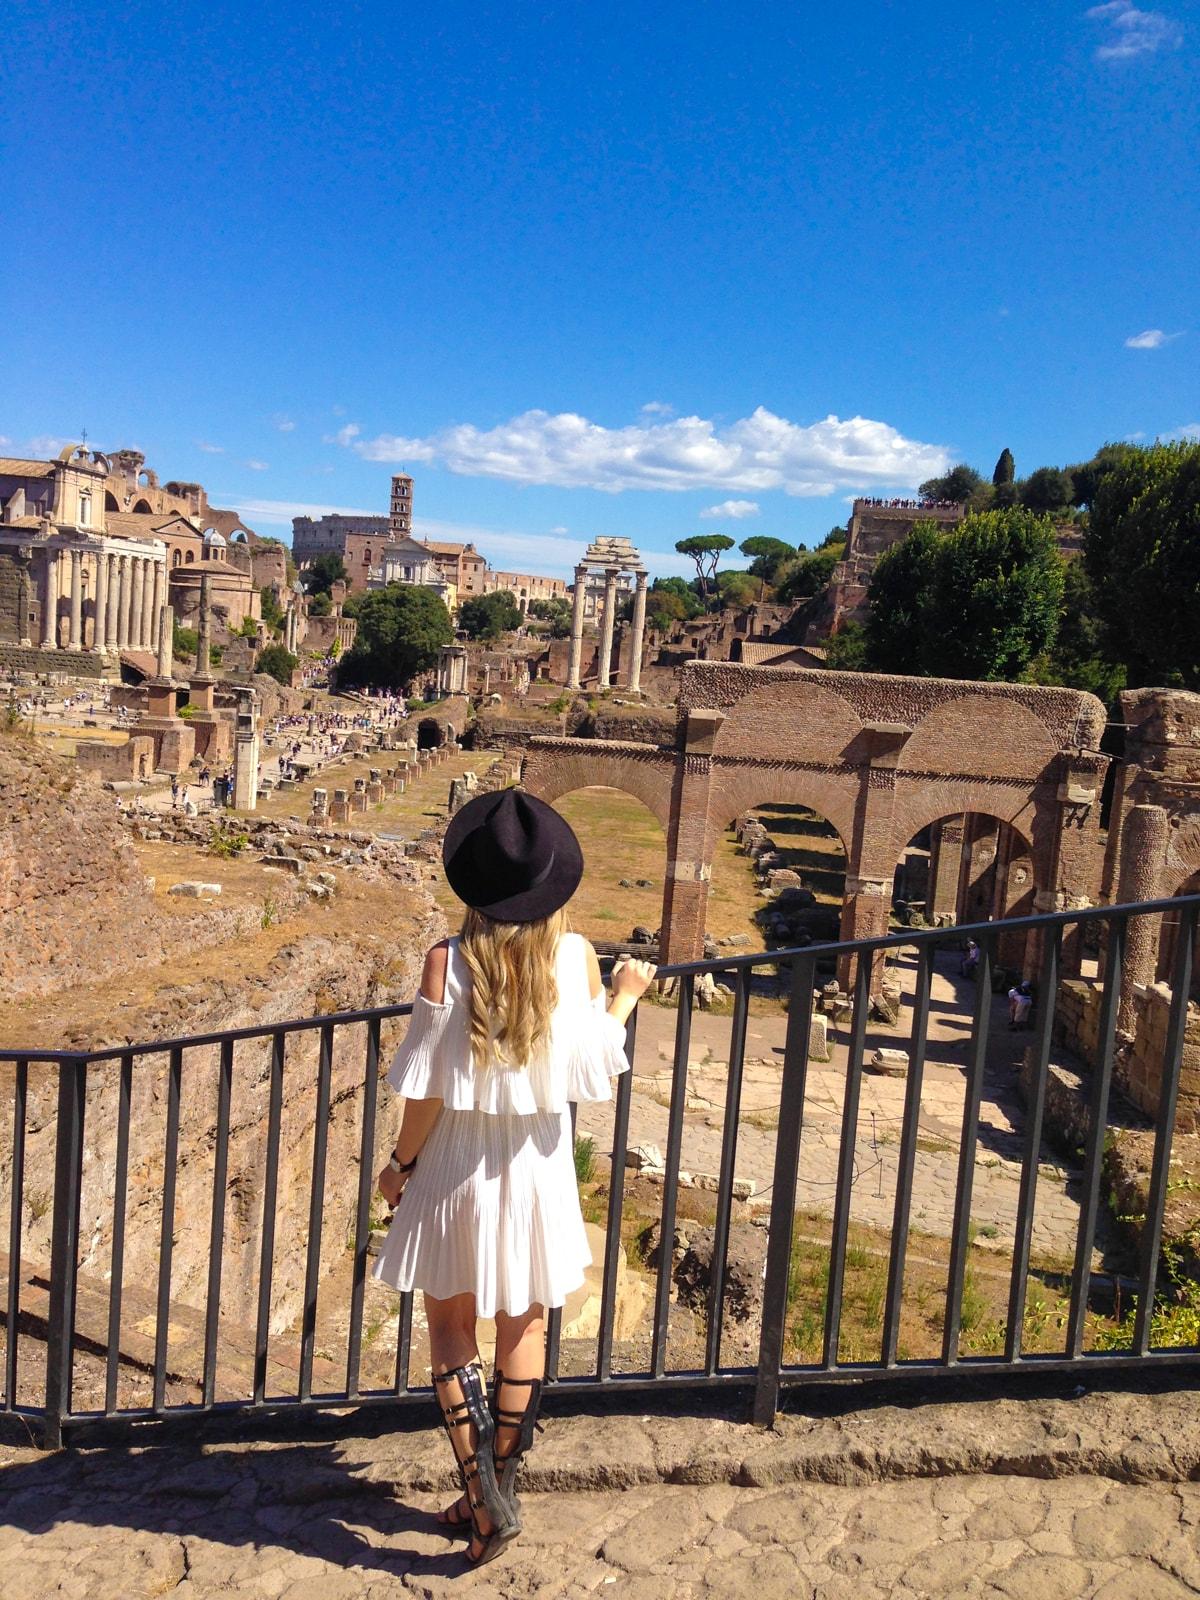 forul roman, vacanta la roma, obiective de vizitat, cum sa eviti cozile, tinuta de vacanta, august 2016